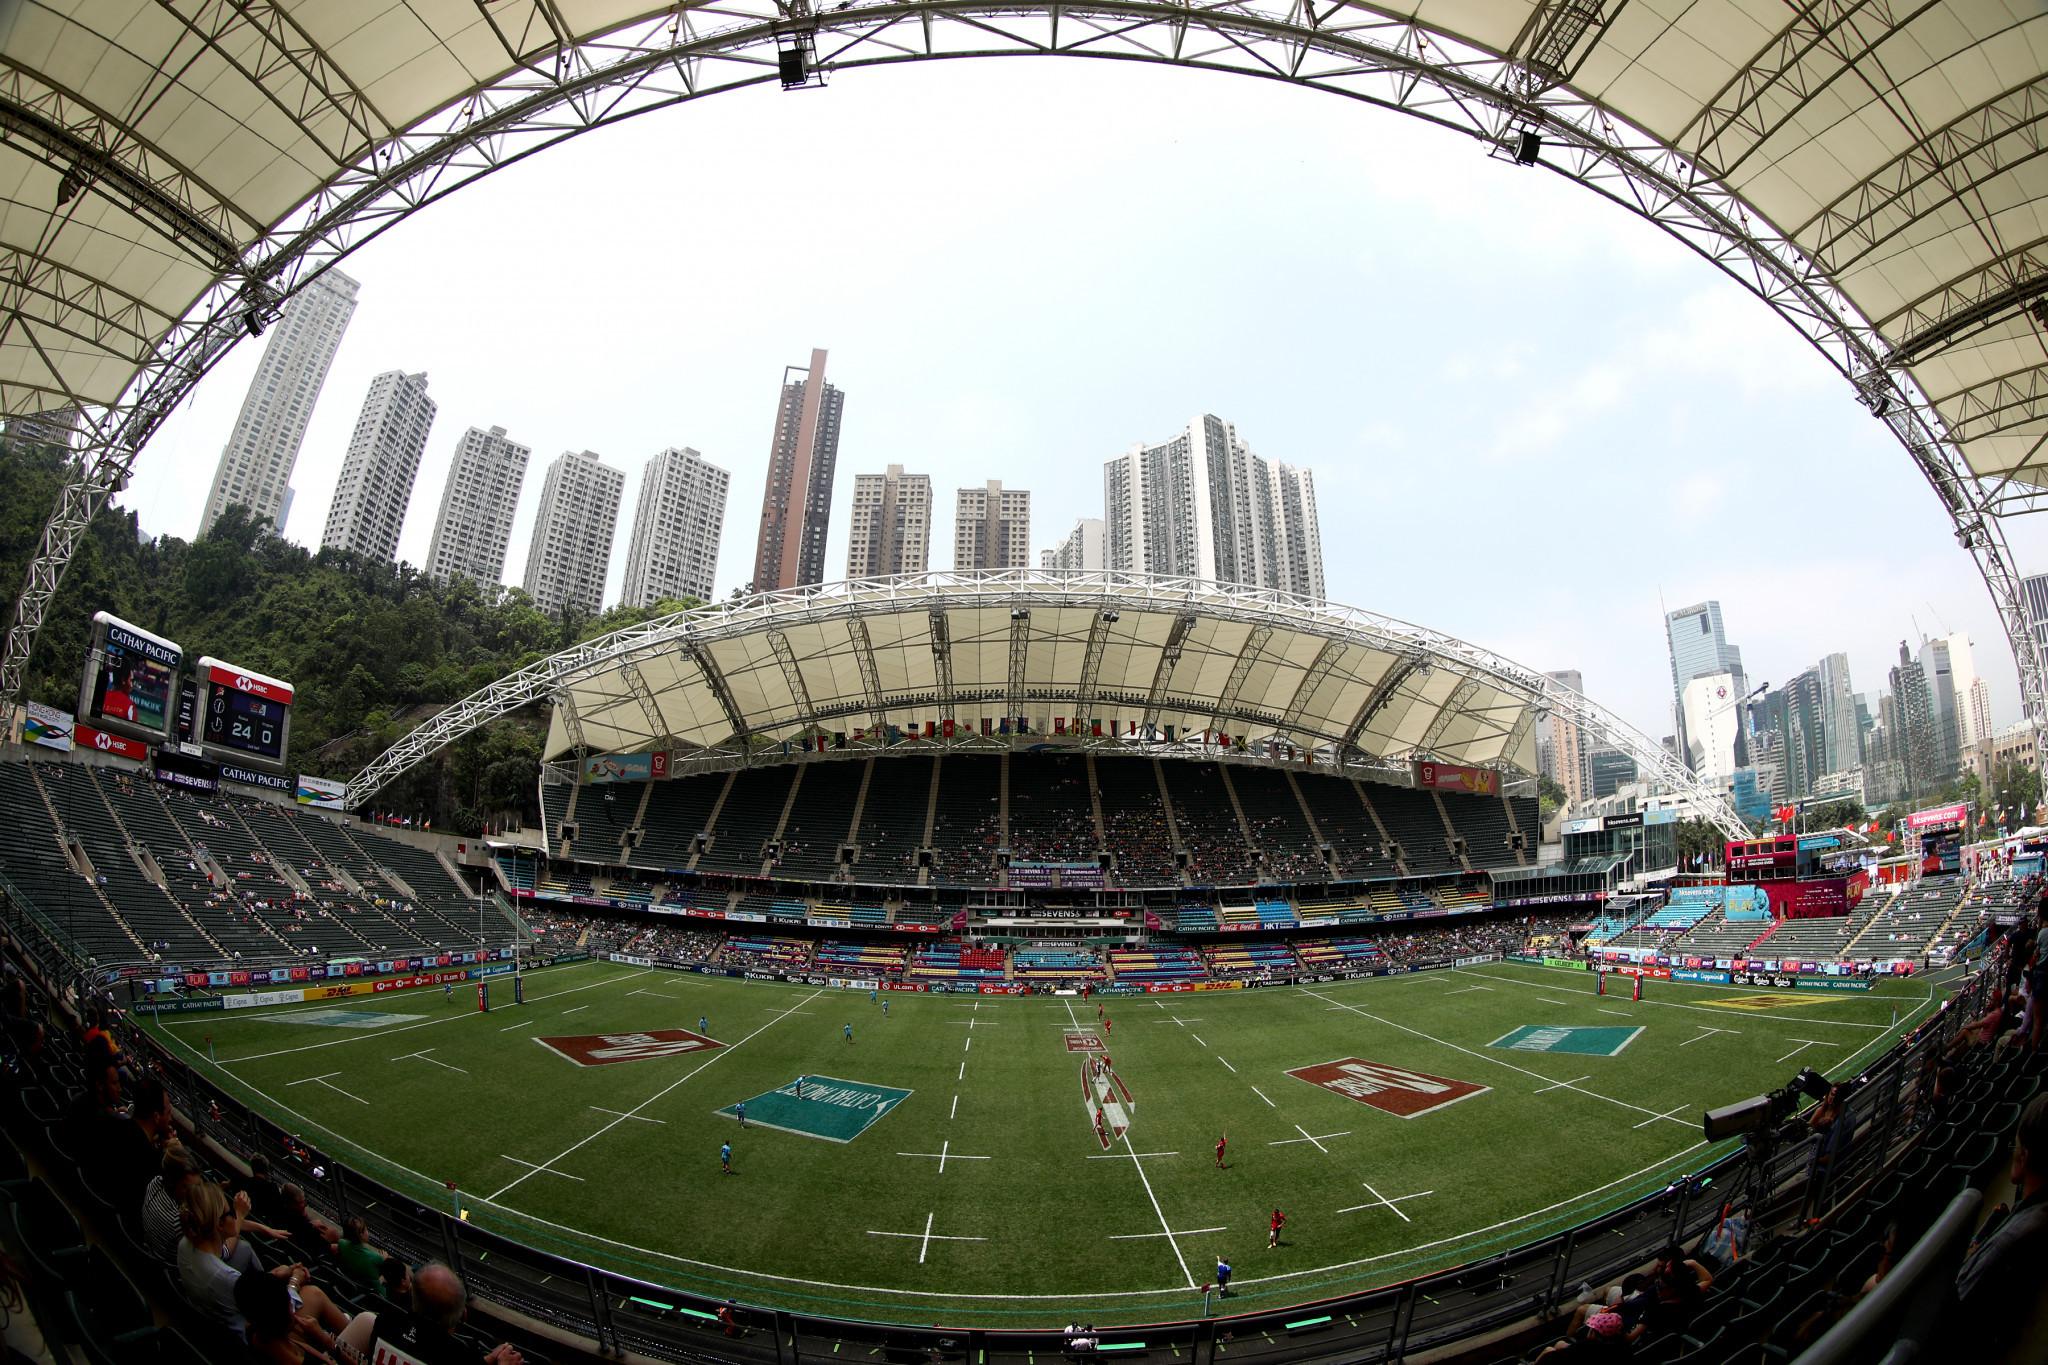 Hong Kong Sevens cancellation leaves dent in revenue for HKRU